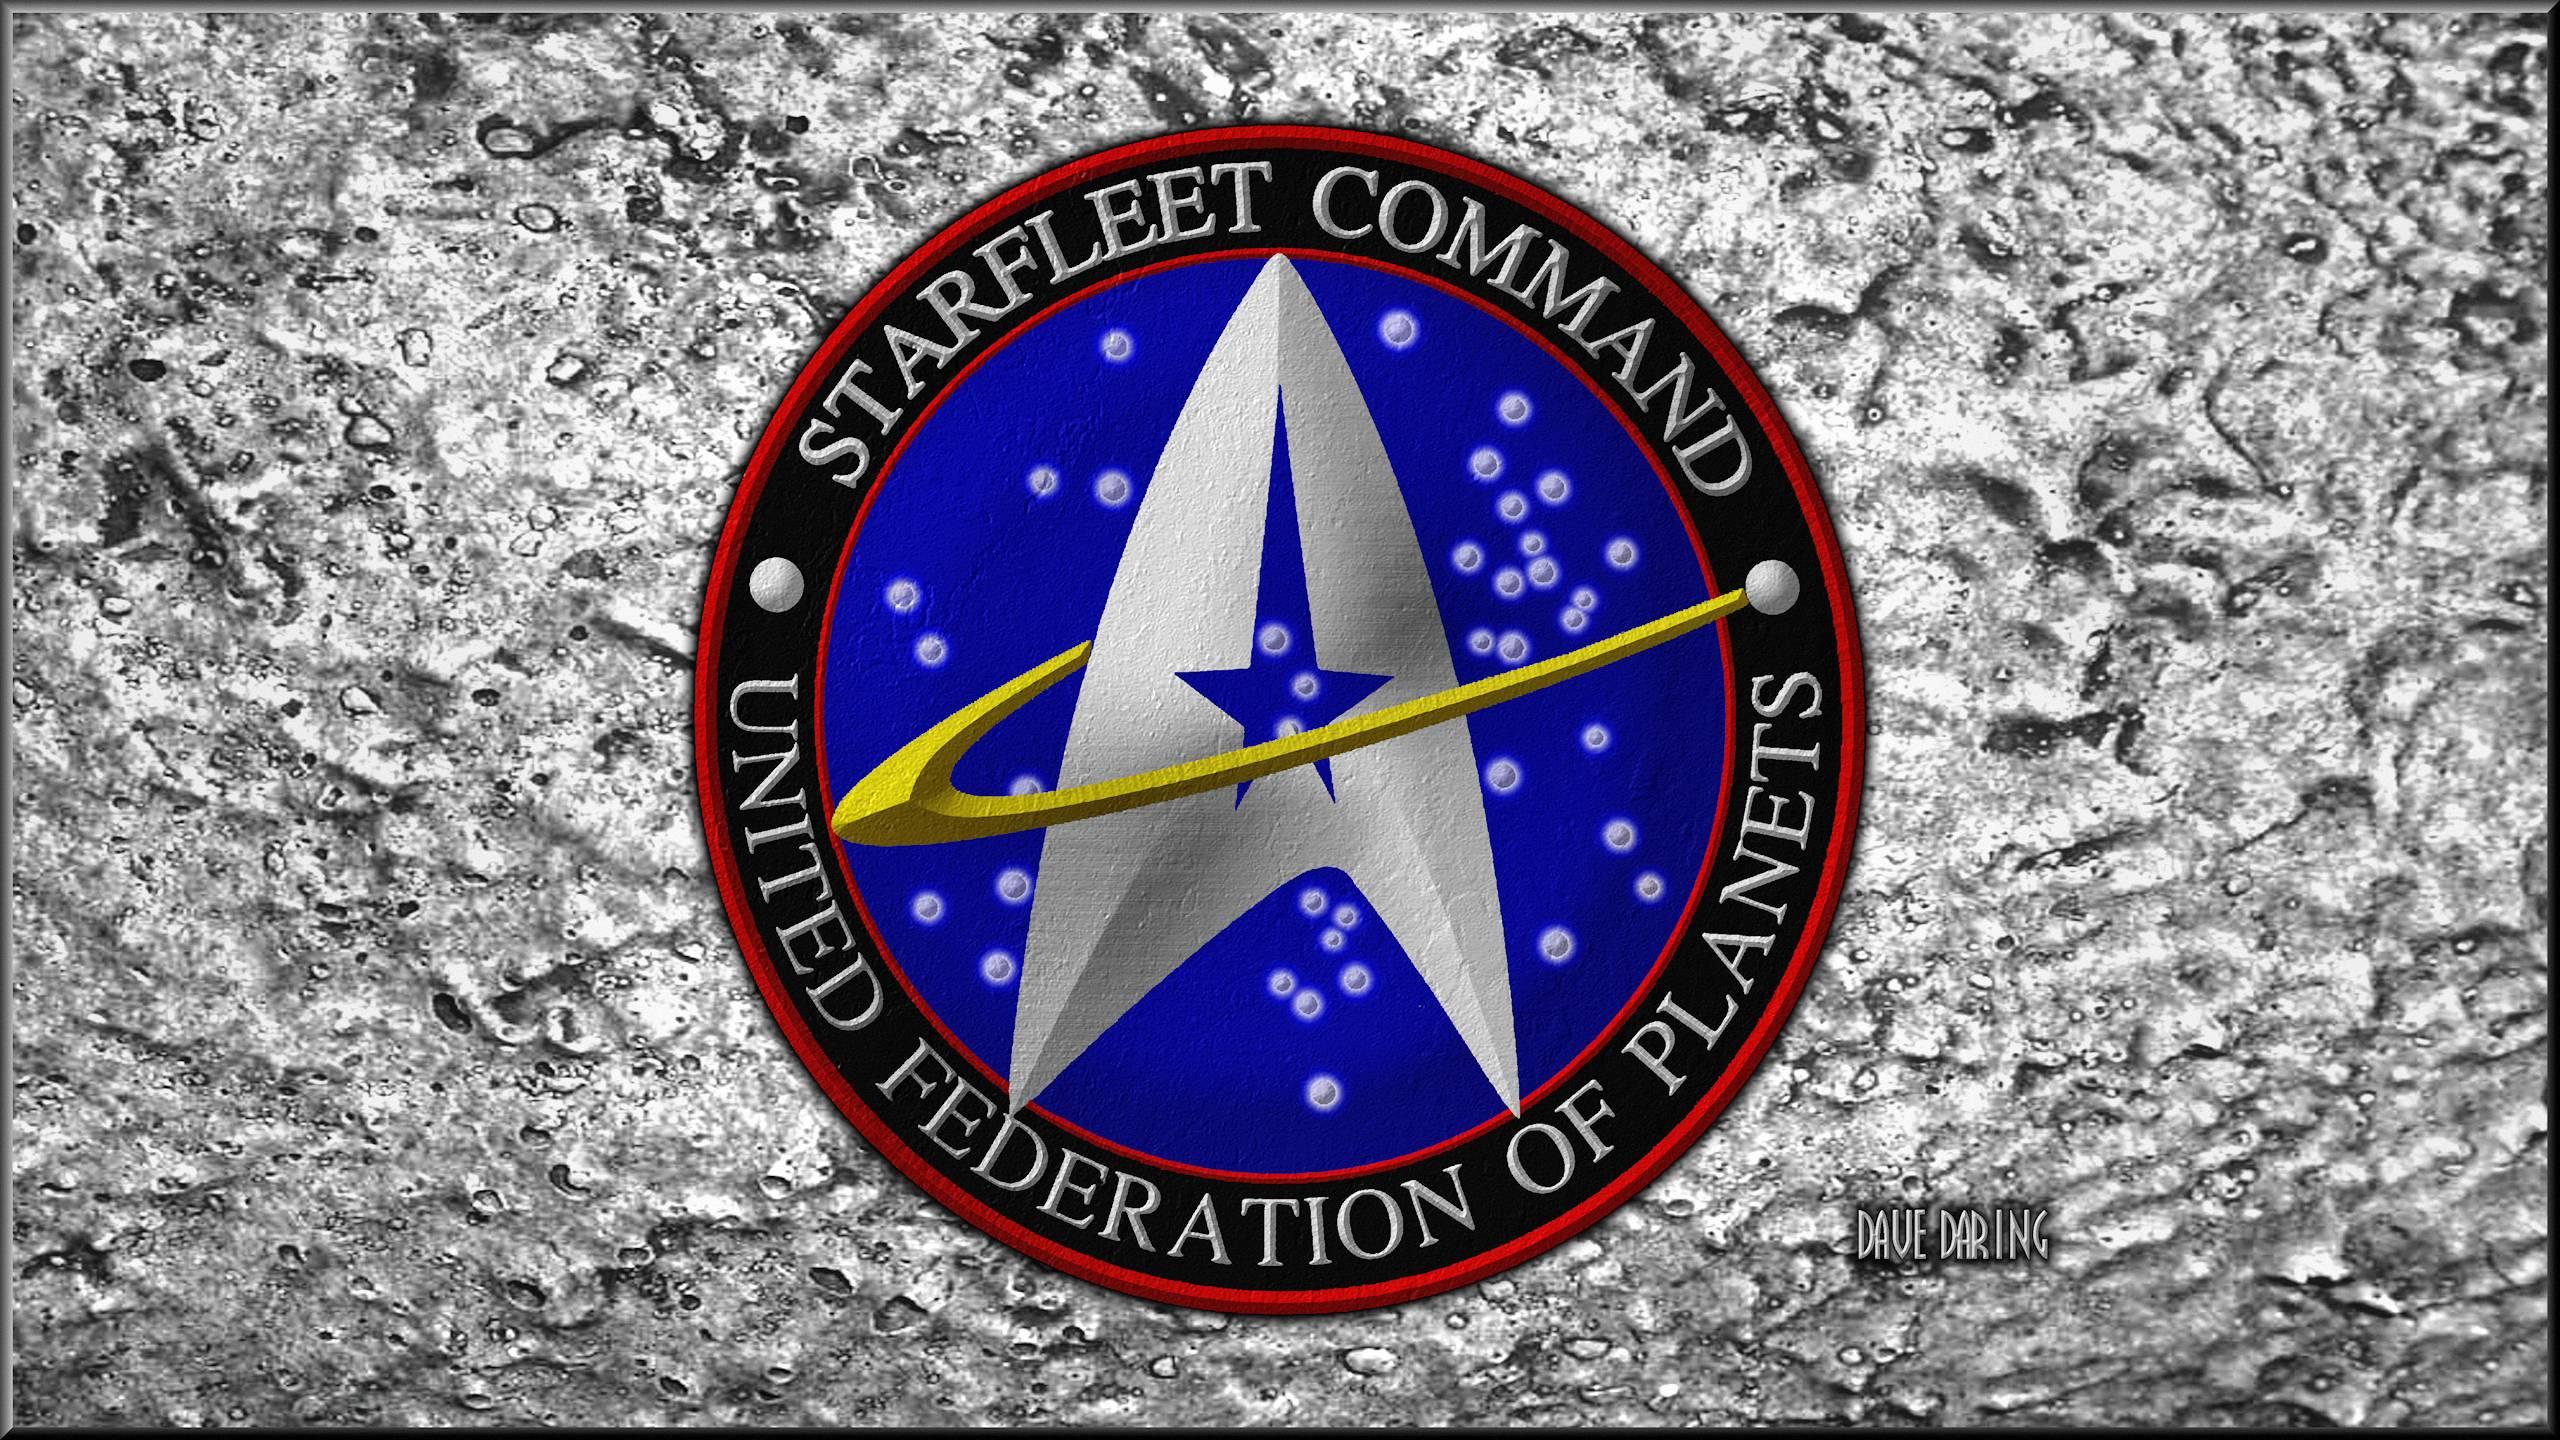 star trek starfleet command wallpaper - photo #8